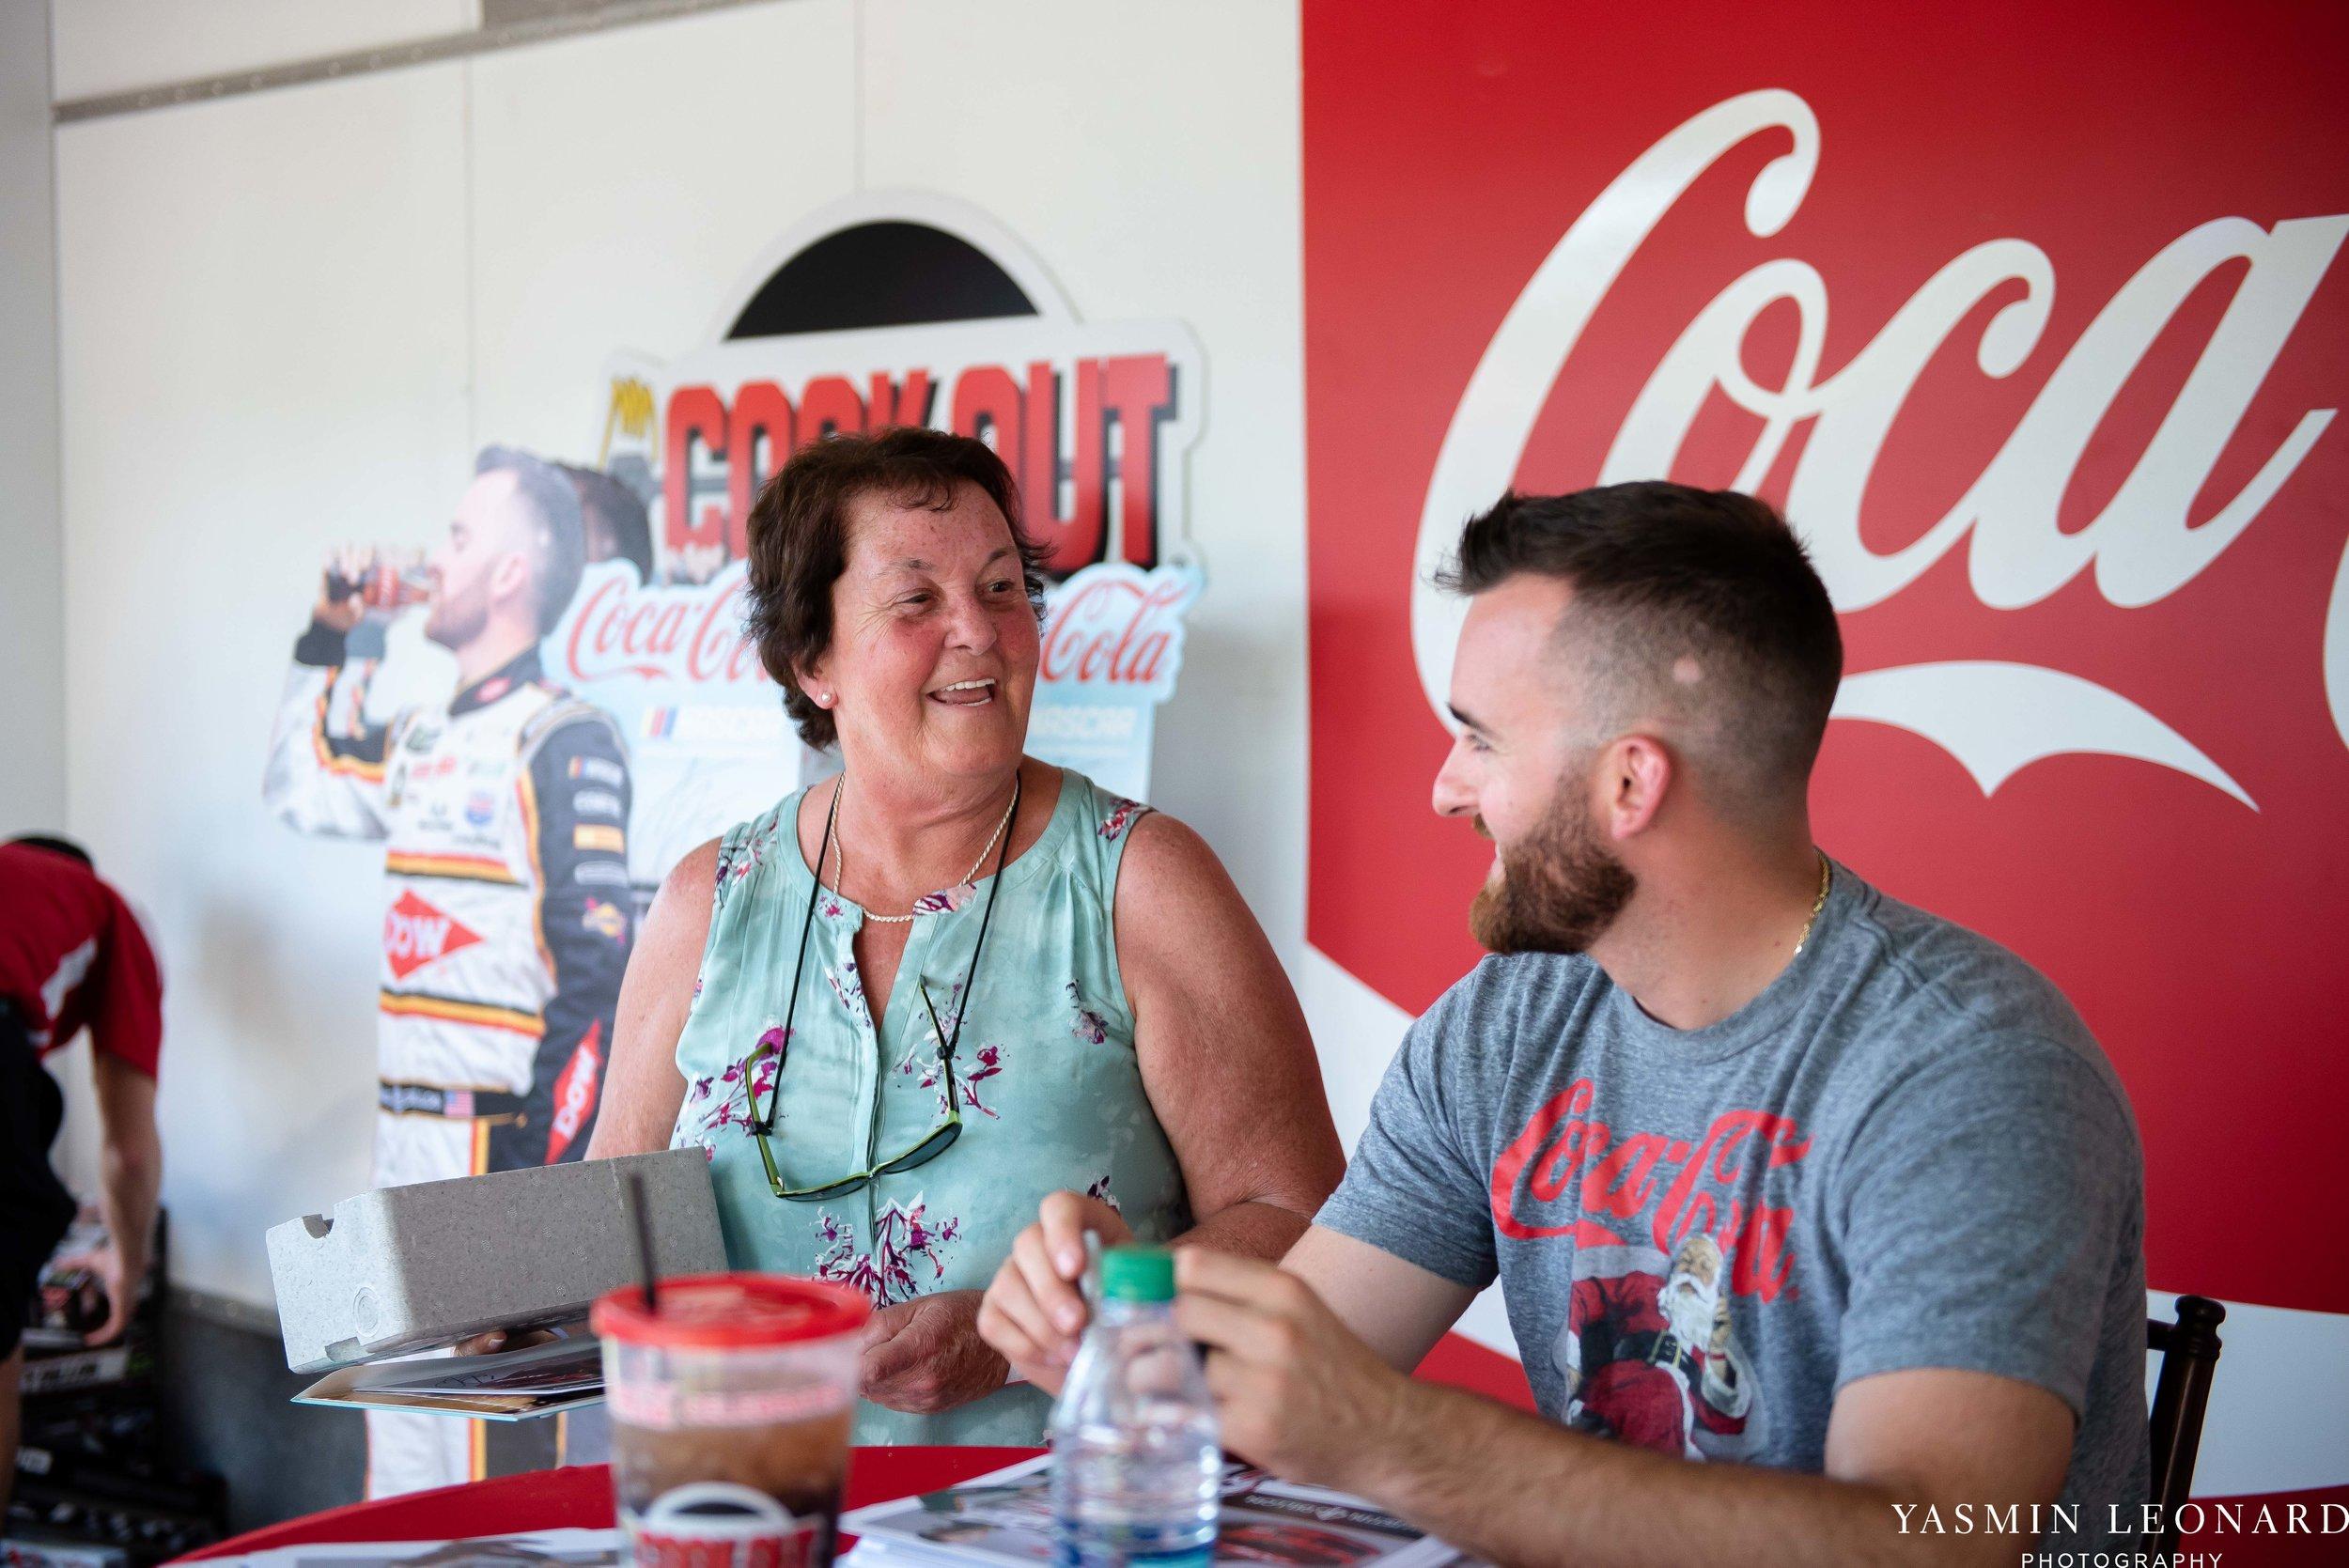 Cookout - CocaCola 600 - Coca Cola - Austin Dillon - Nascar - Nascar Meet and Greet - Yasmin Leonard Photography-16.jpg